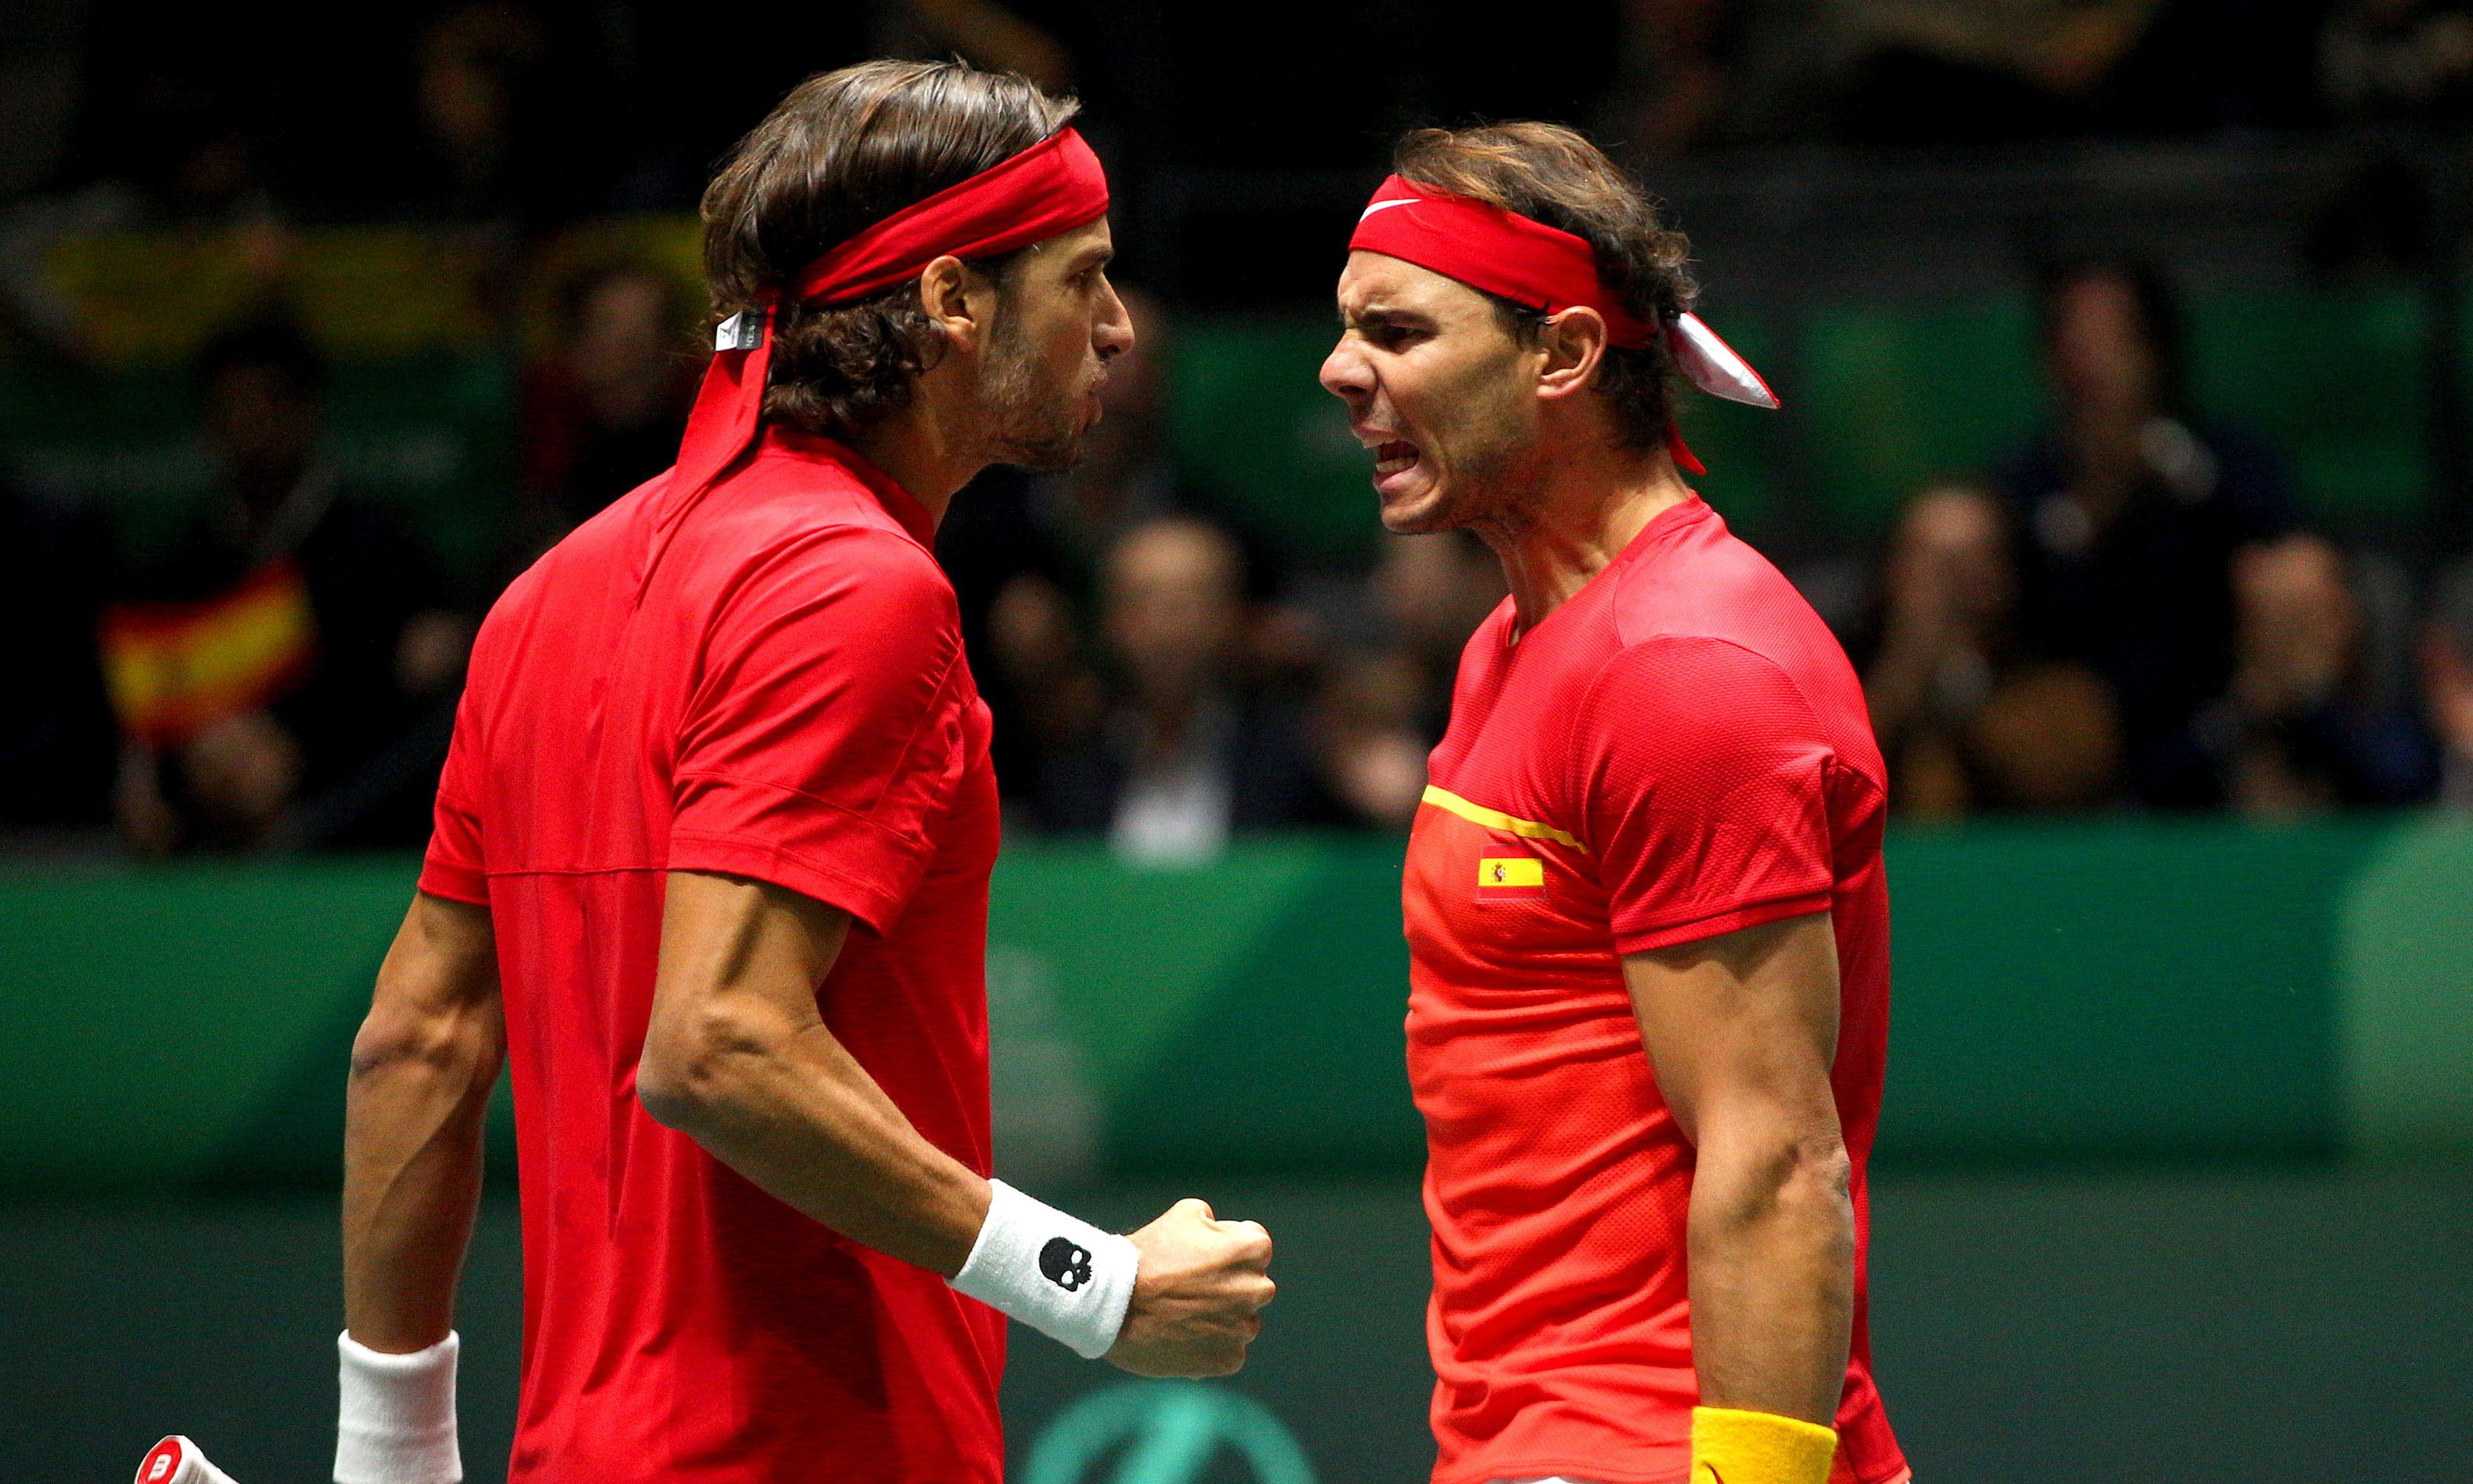 Rafael Nadal powers Spain past Great Britain into Davis Cup final